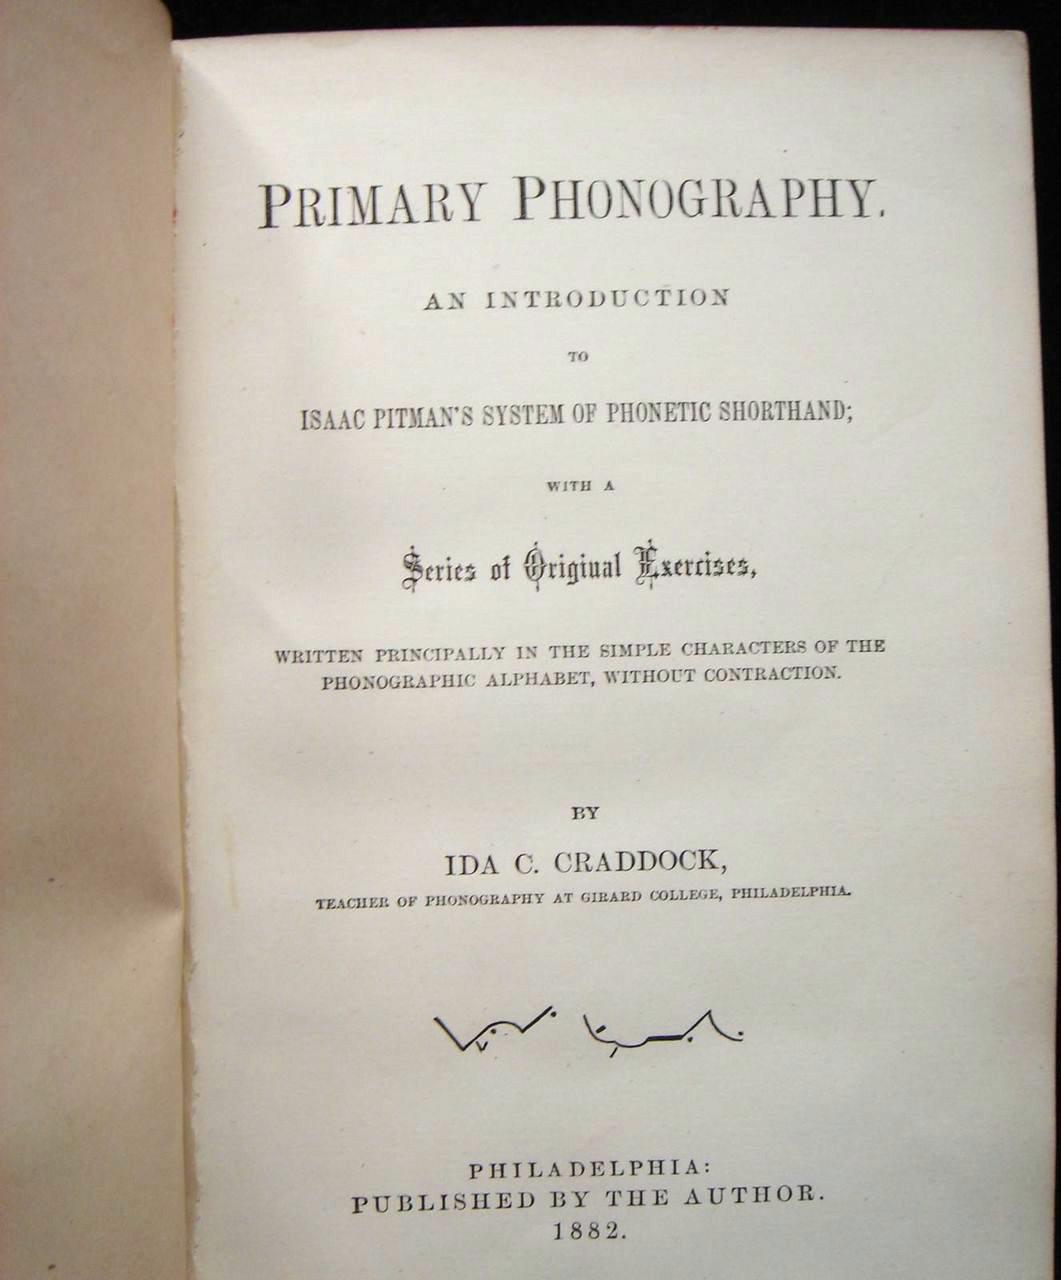 PRIMARY PHONOGRAPHY (Pitman), by Ida C. Craddock - 1882 [1st Ed]